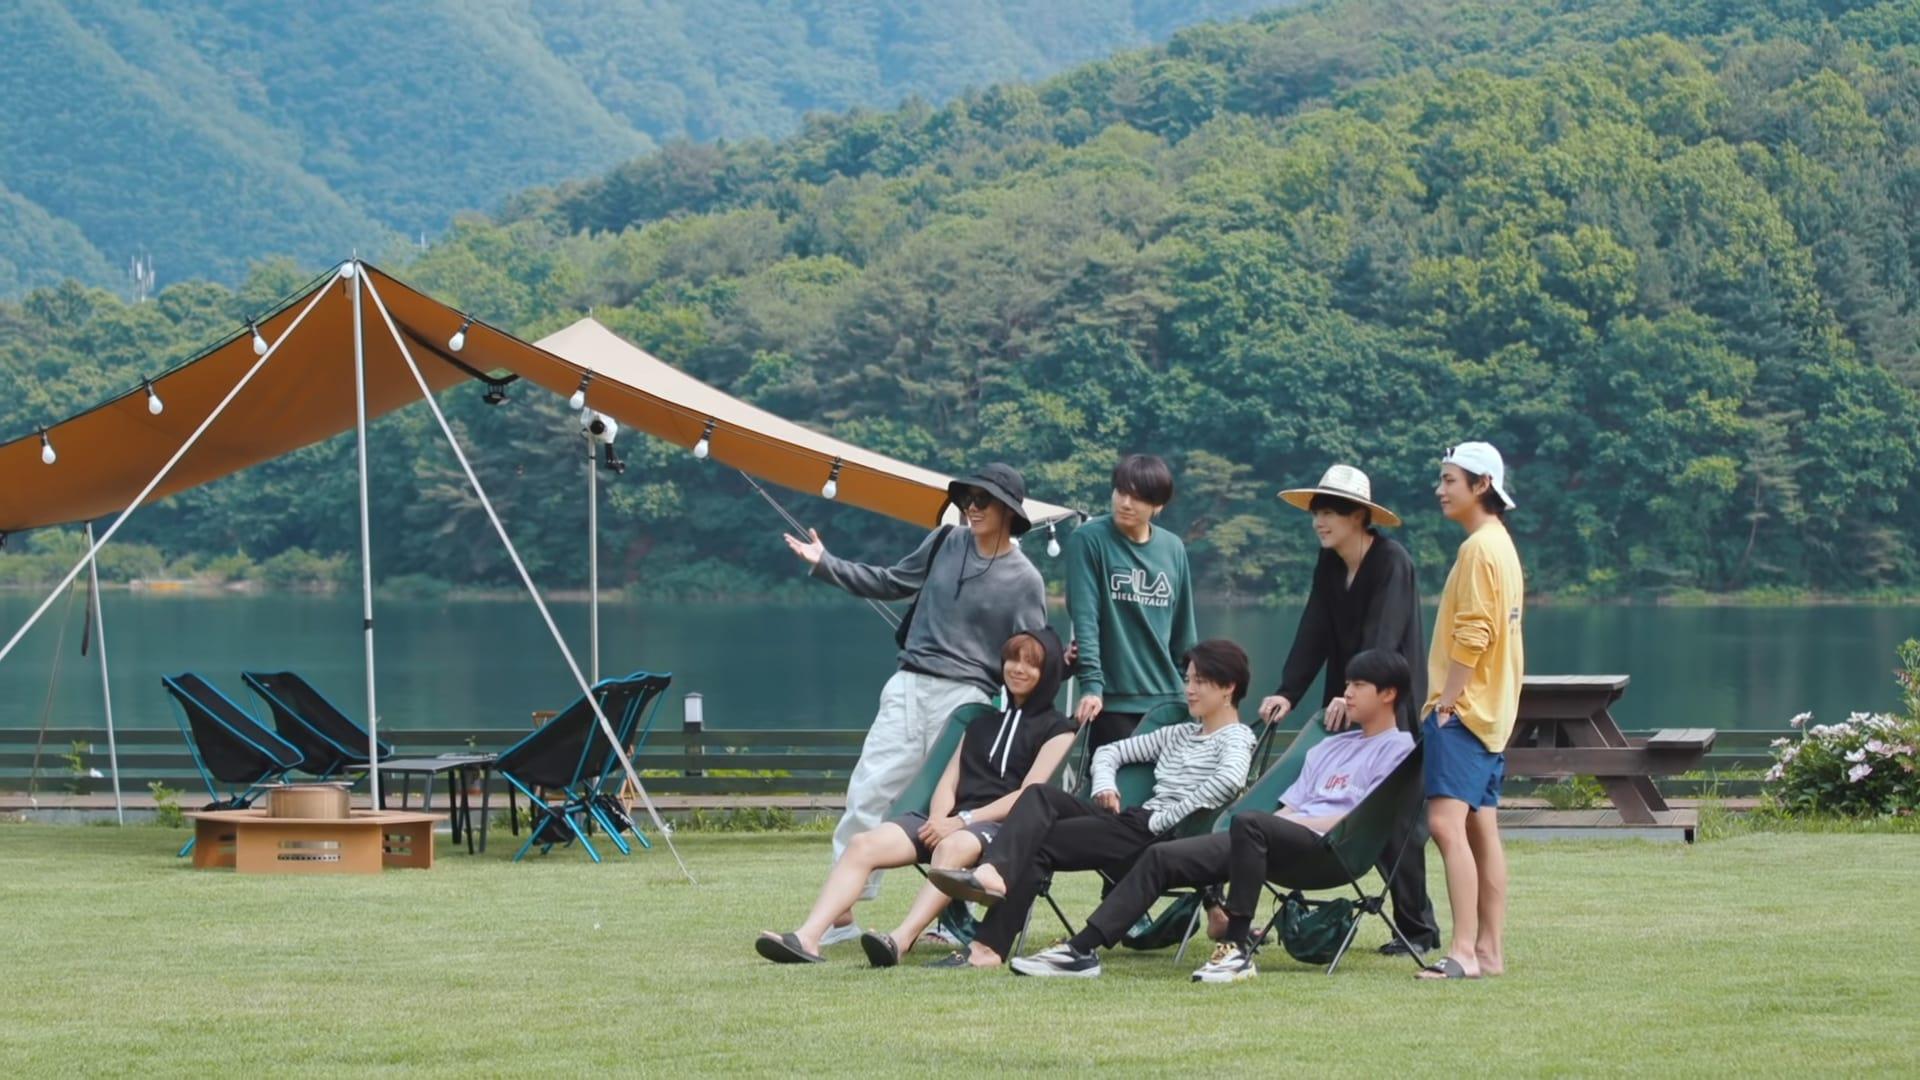 720p~ In the SOOP BTS ver. Season 1 Episode 2